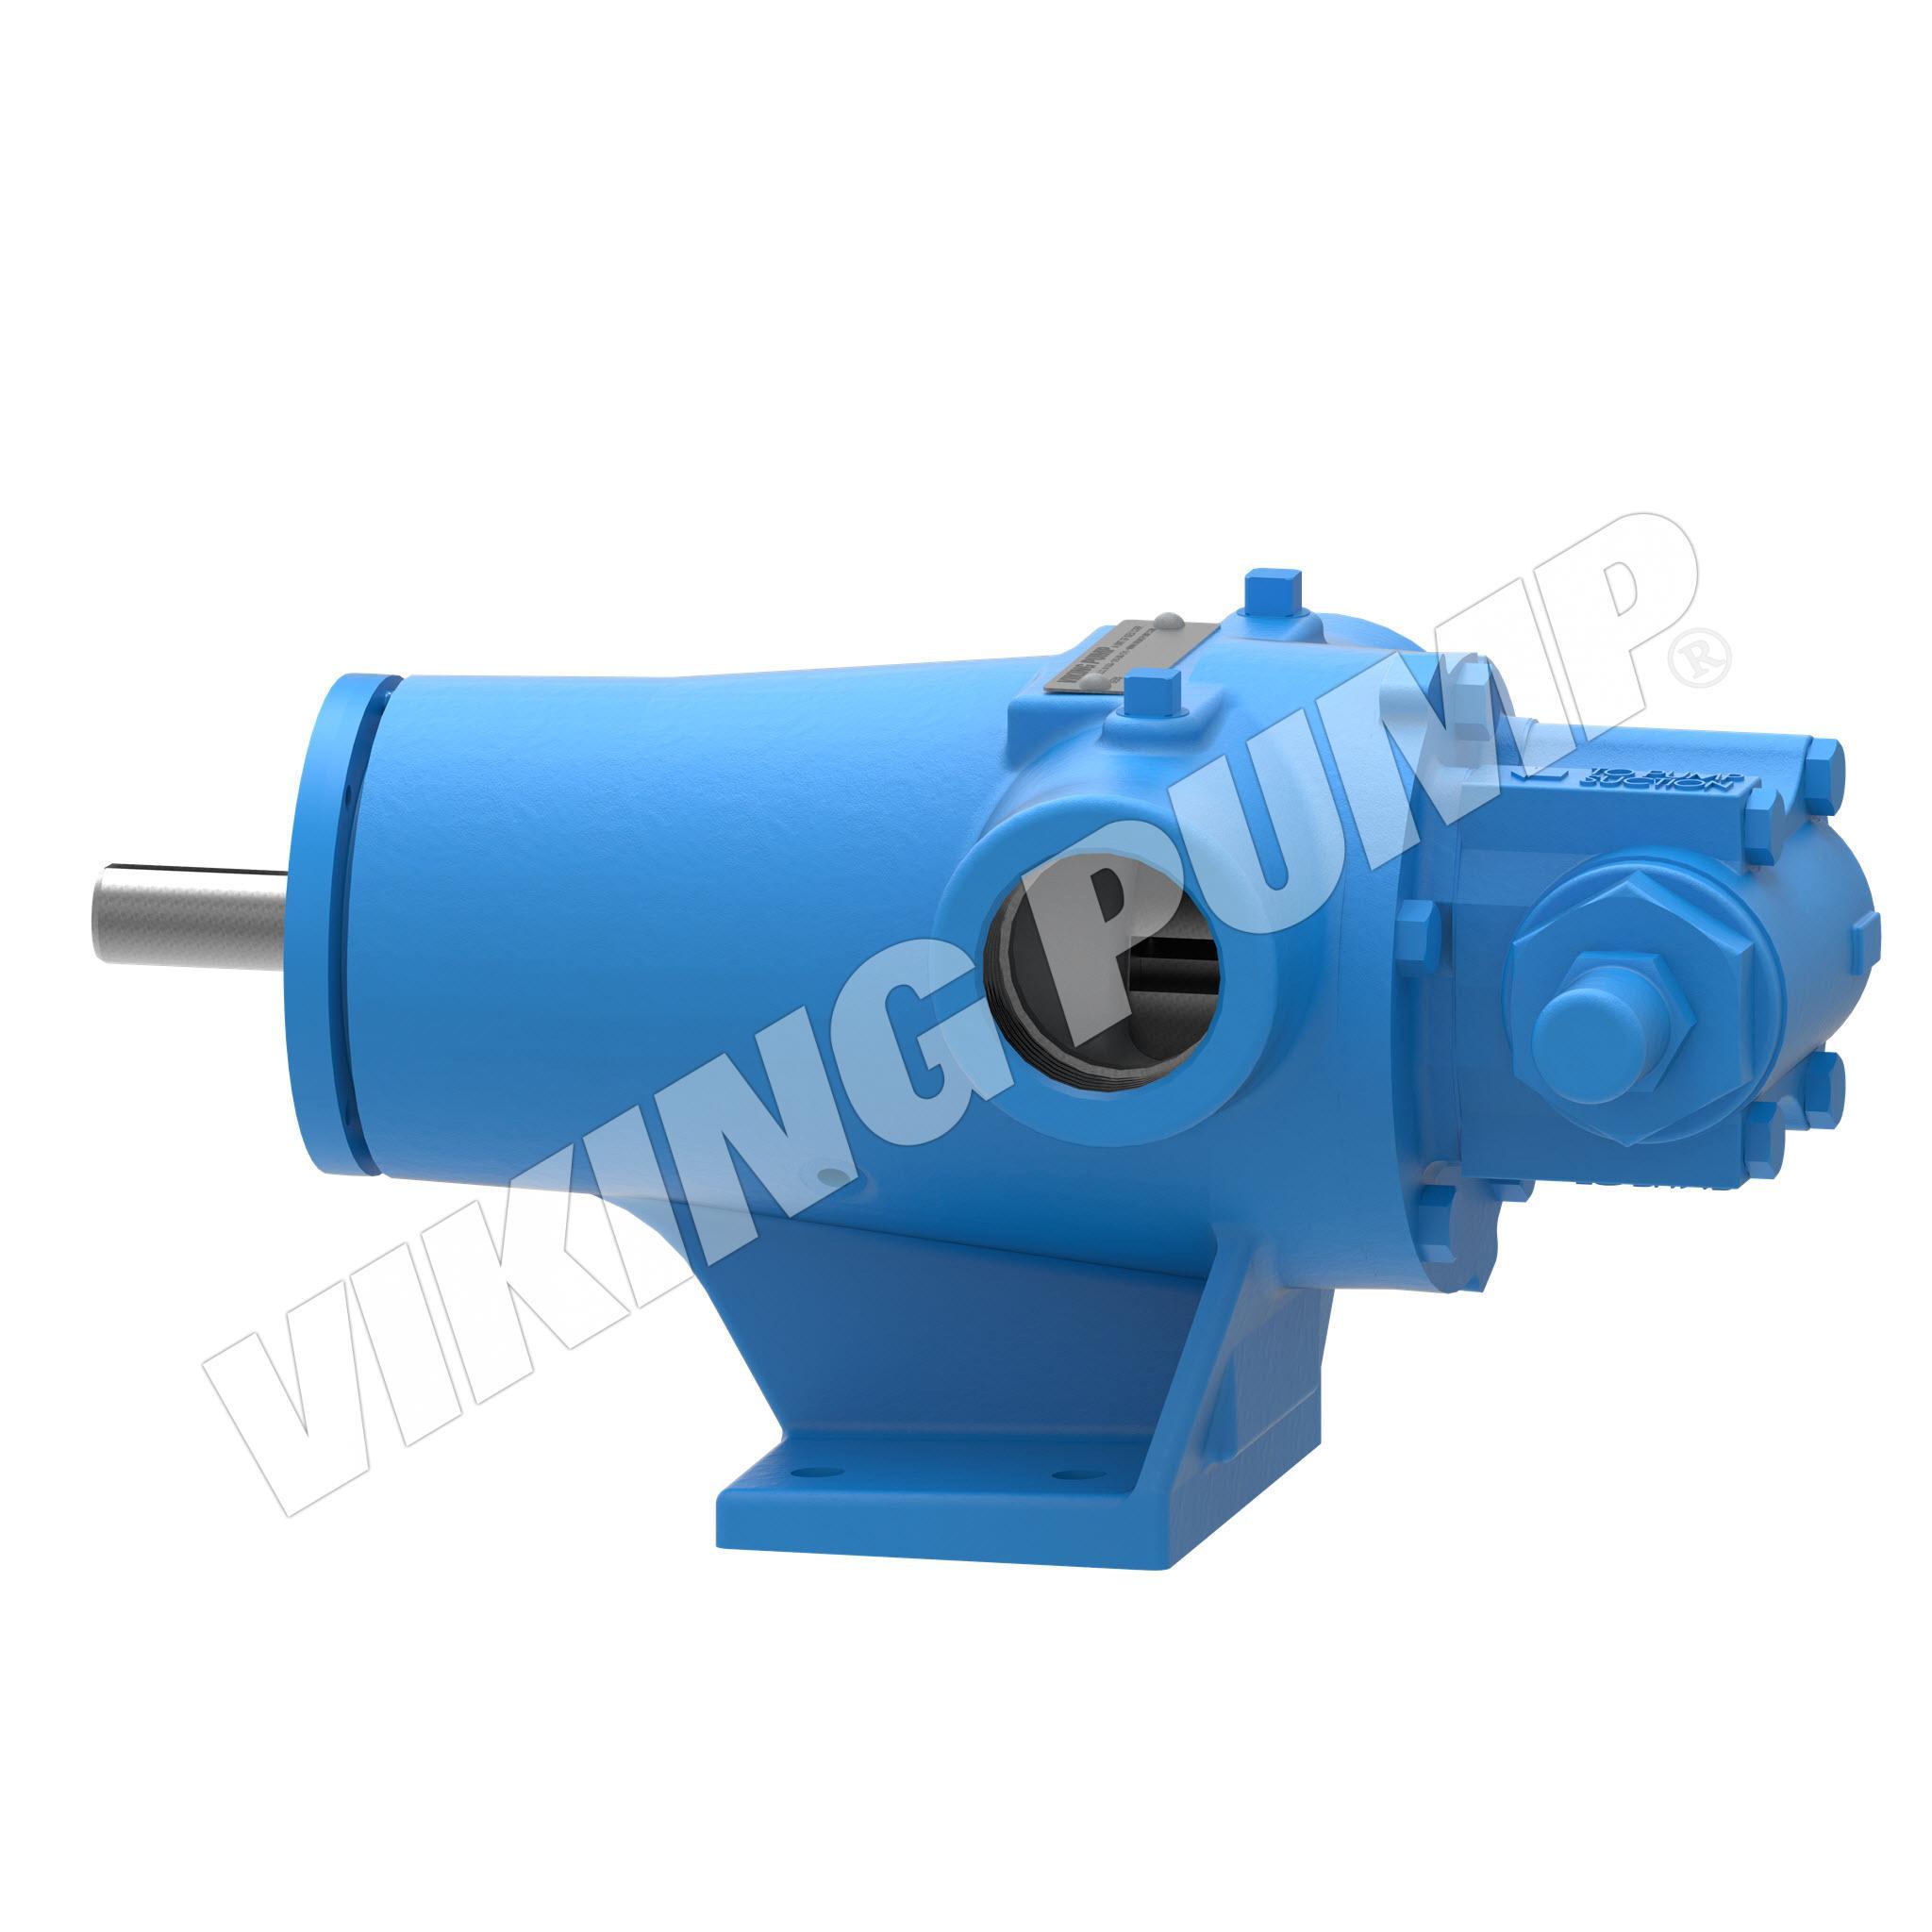 4195 series viking rh vikingpump com A O. Smith Well Pump Parts Diagram Diagram of Pool Pump Connections